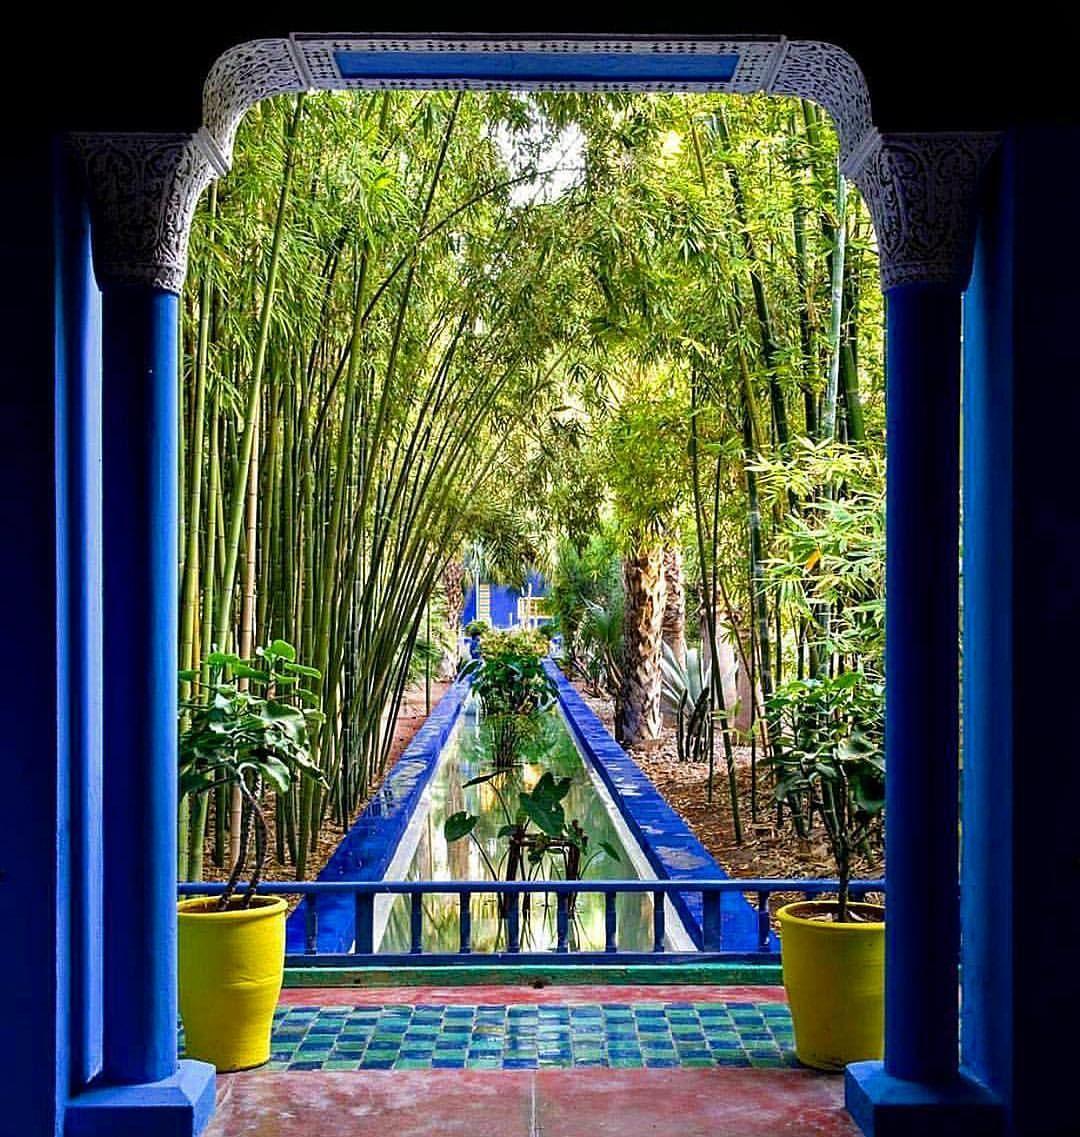 Botanicaetcetera Jardin Majorelle Ysl S Marrakech Garden With The